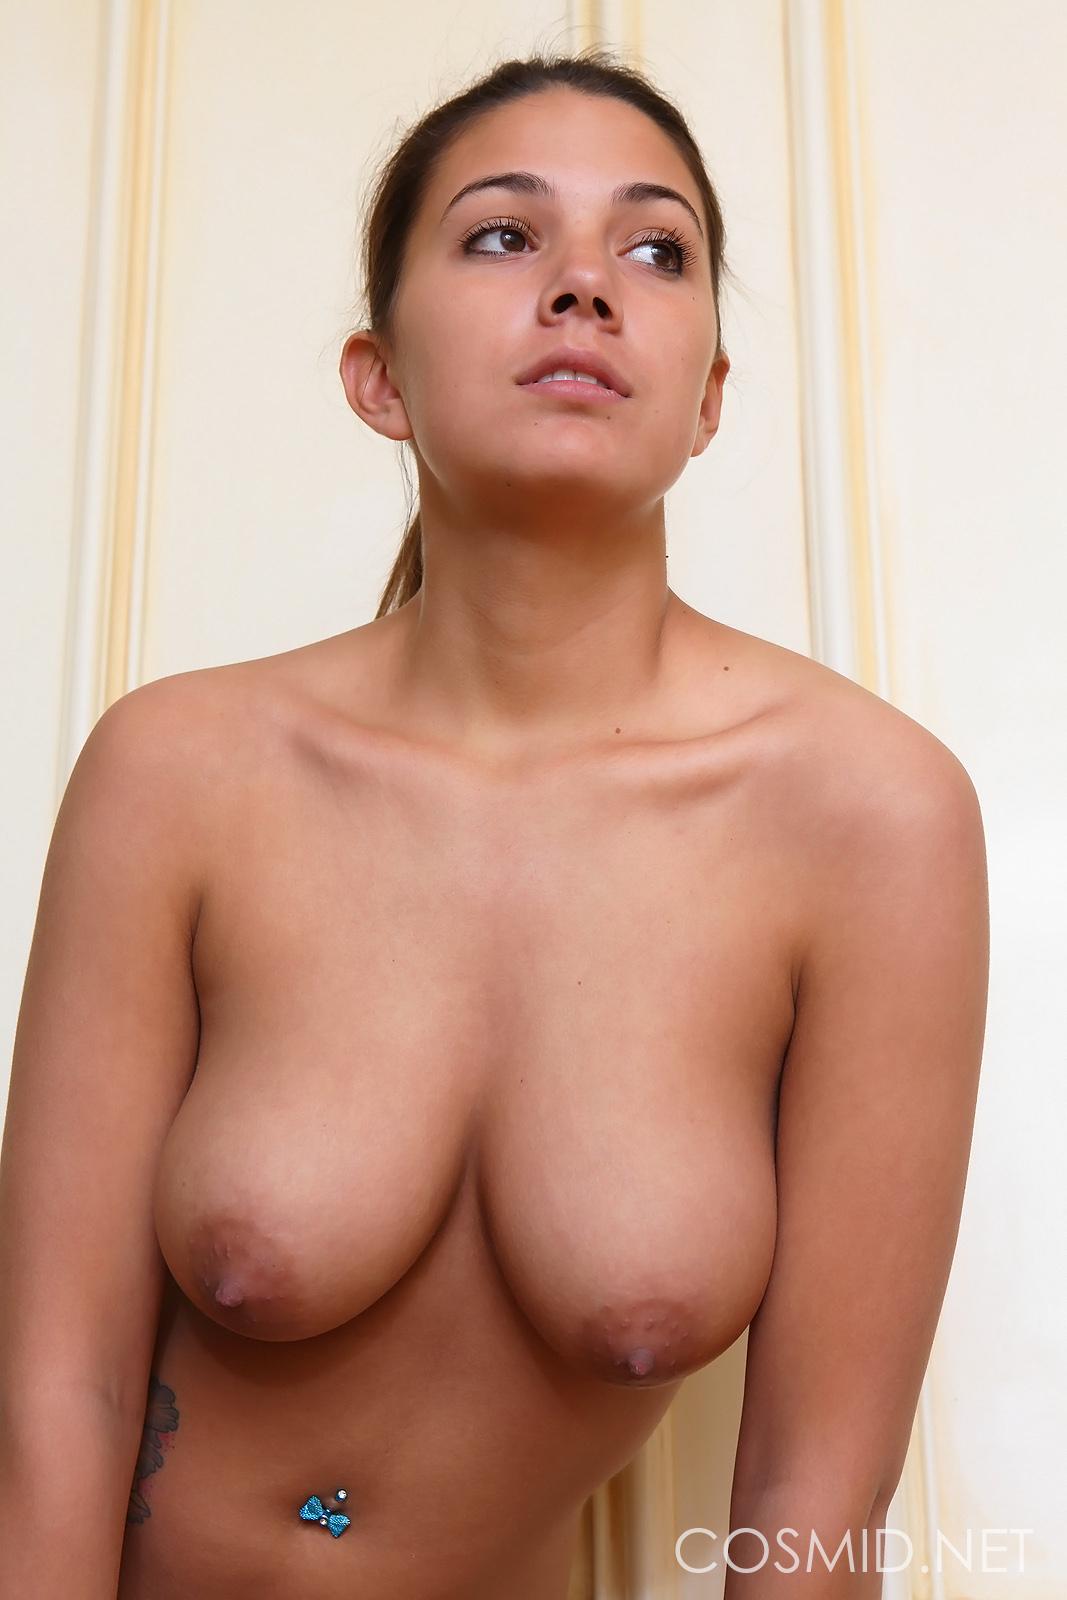 jaycee west nude